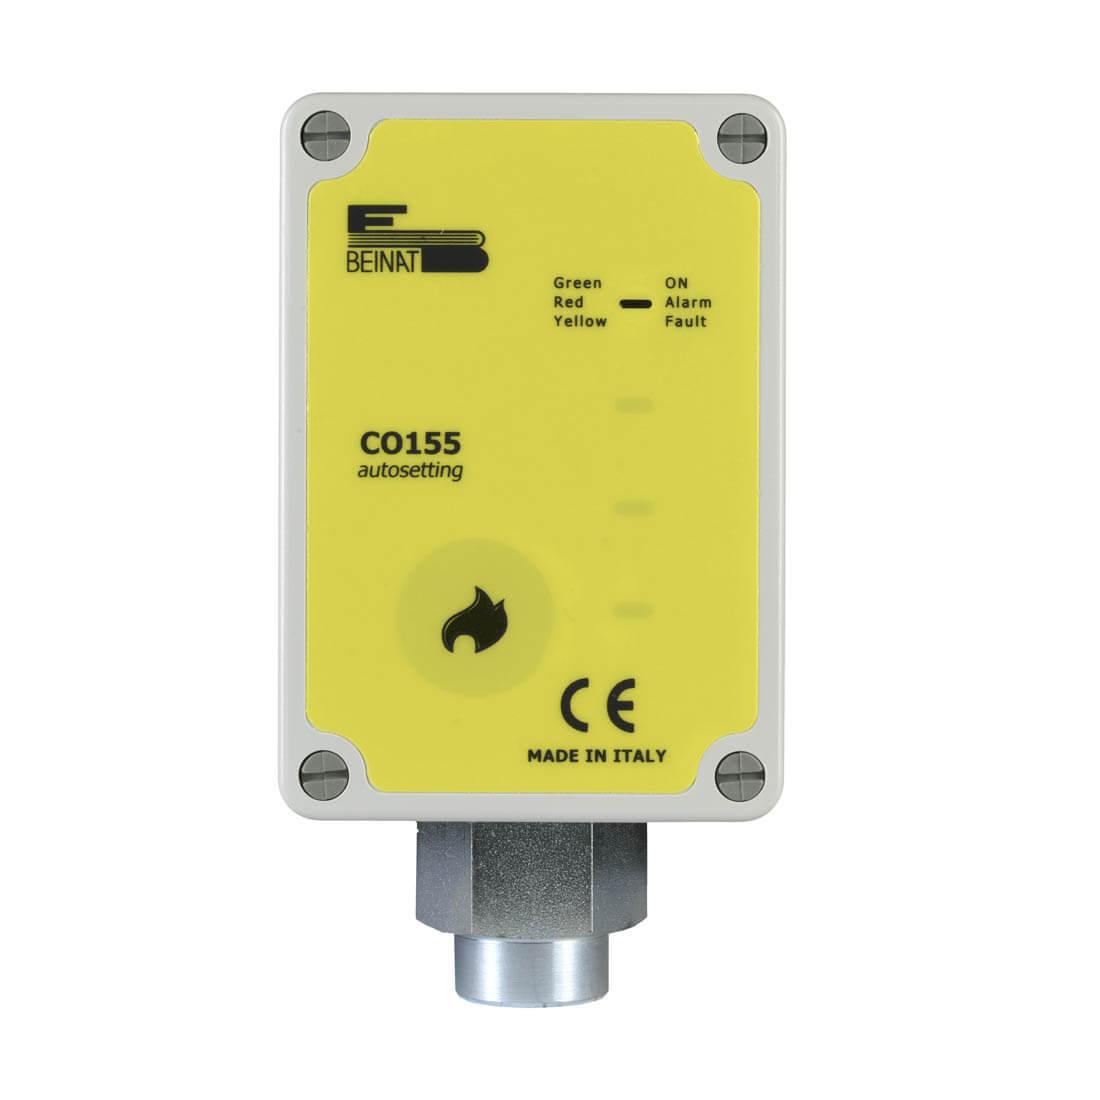 CO155